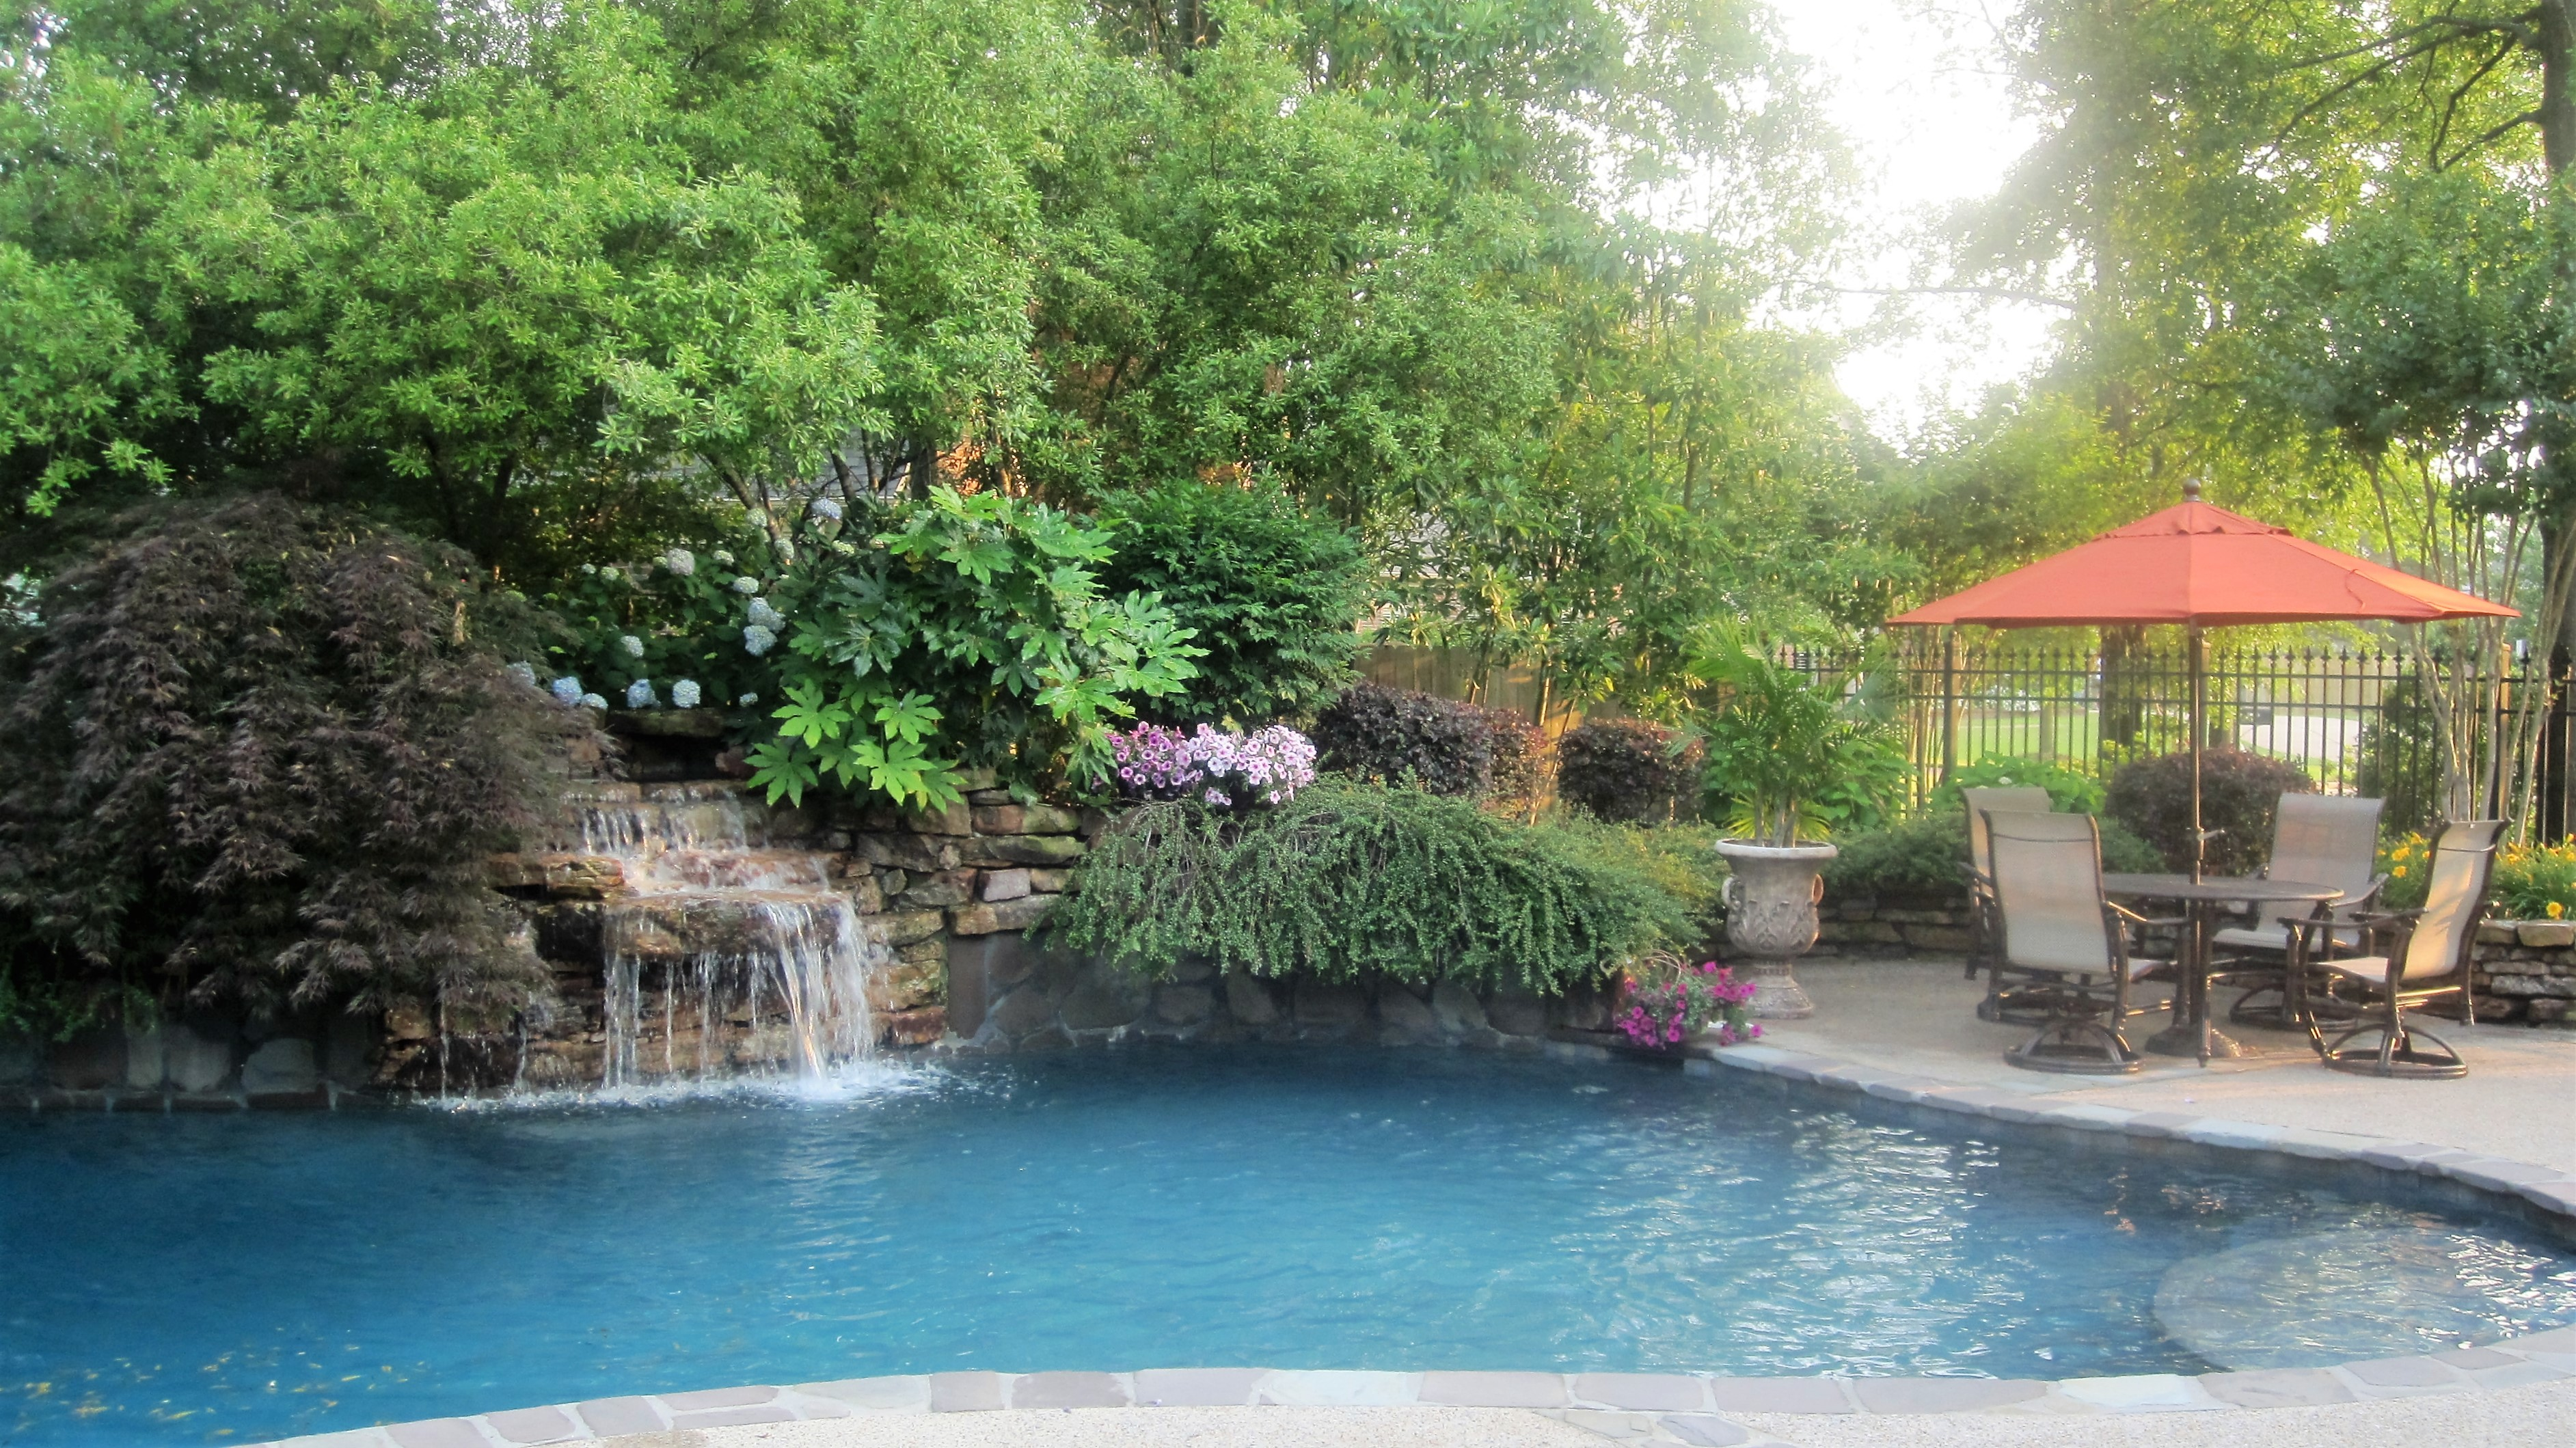 Swimming Pools & Waterfalls - Memphis Landscaping Company